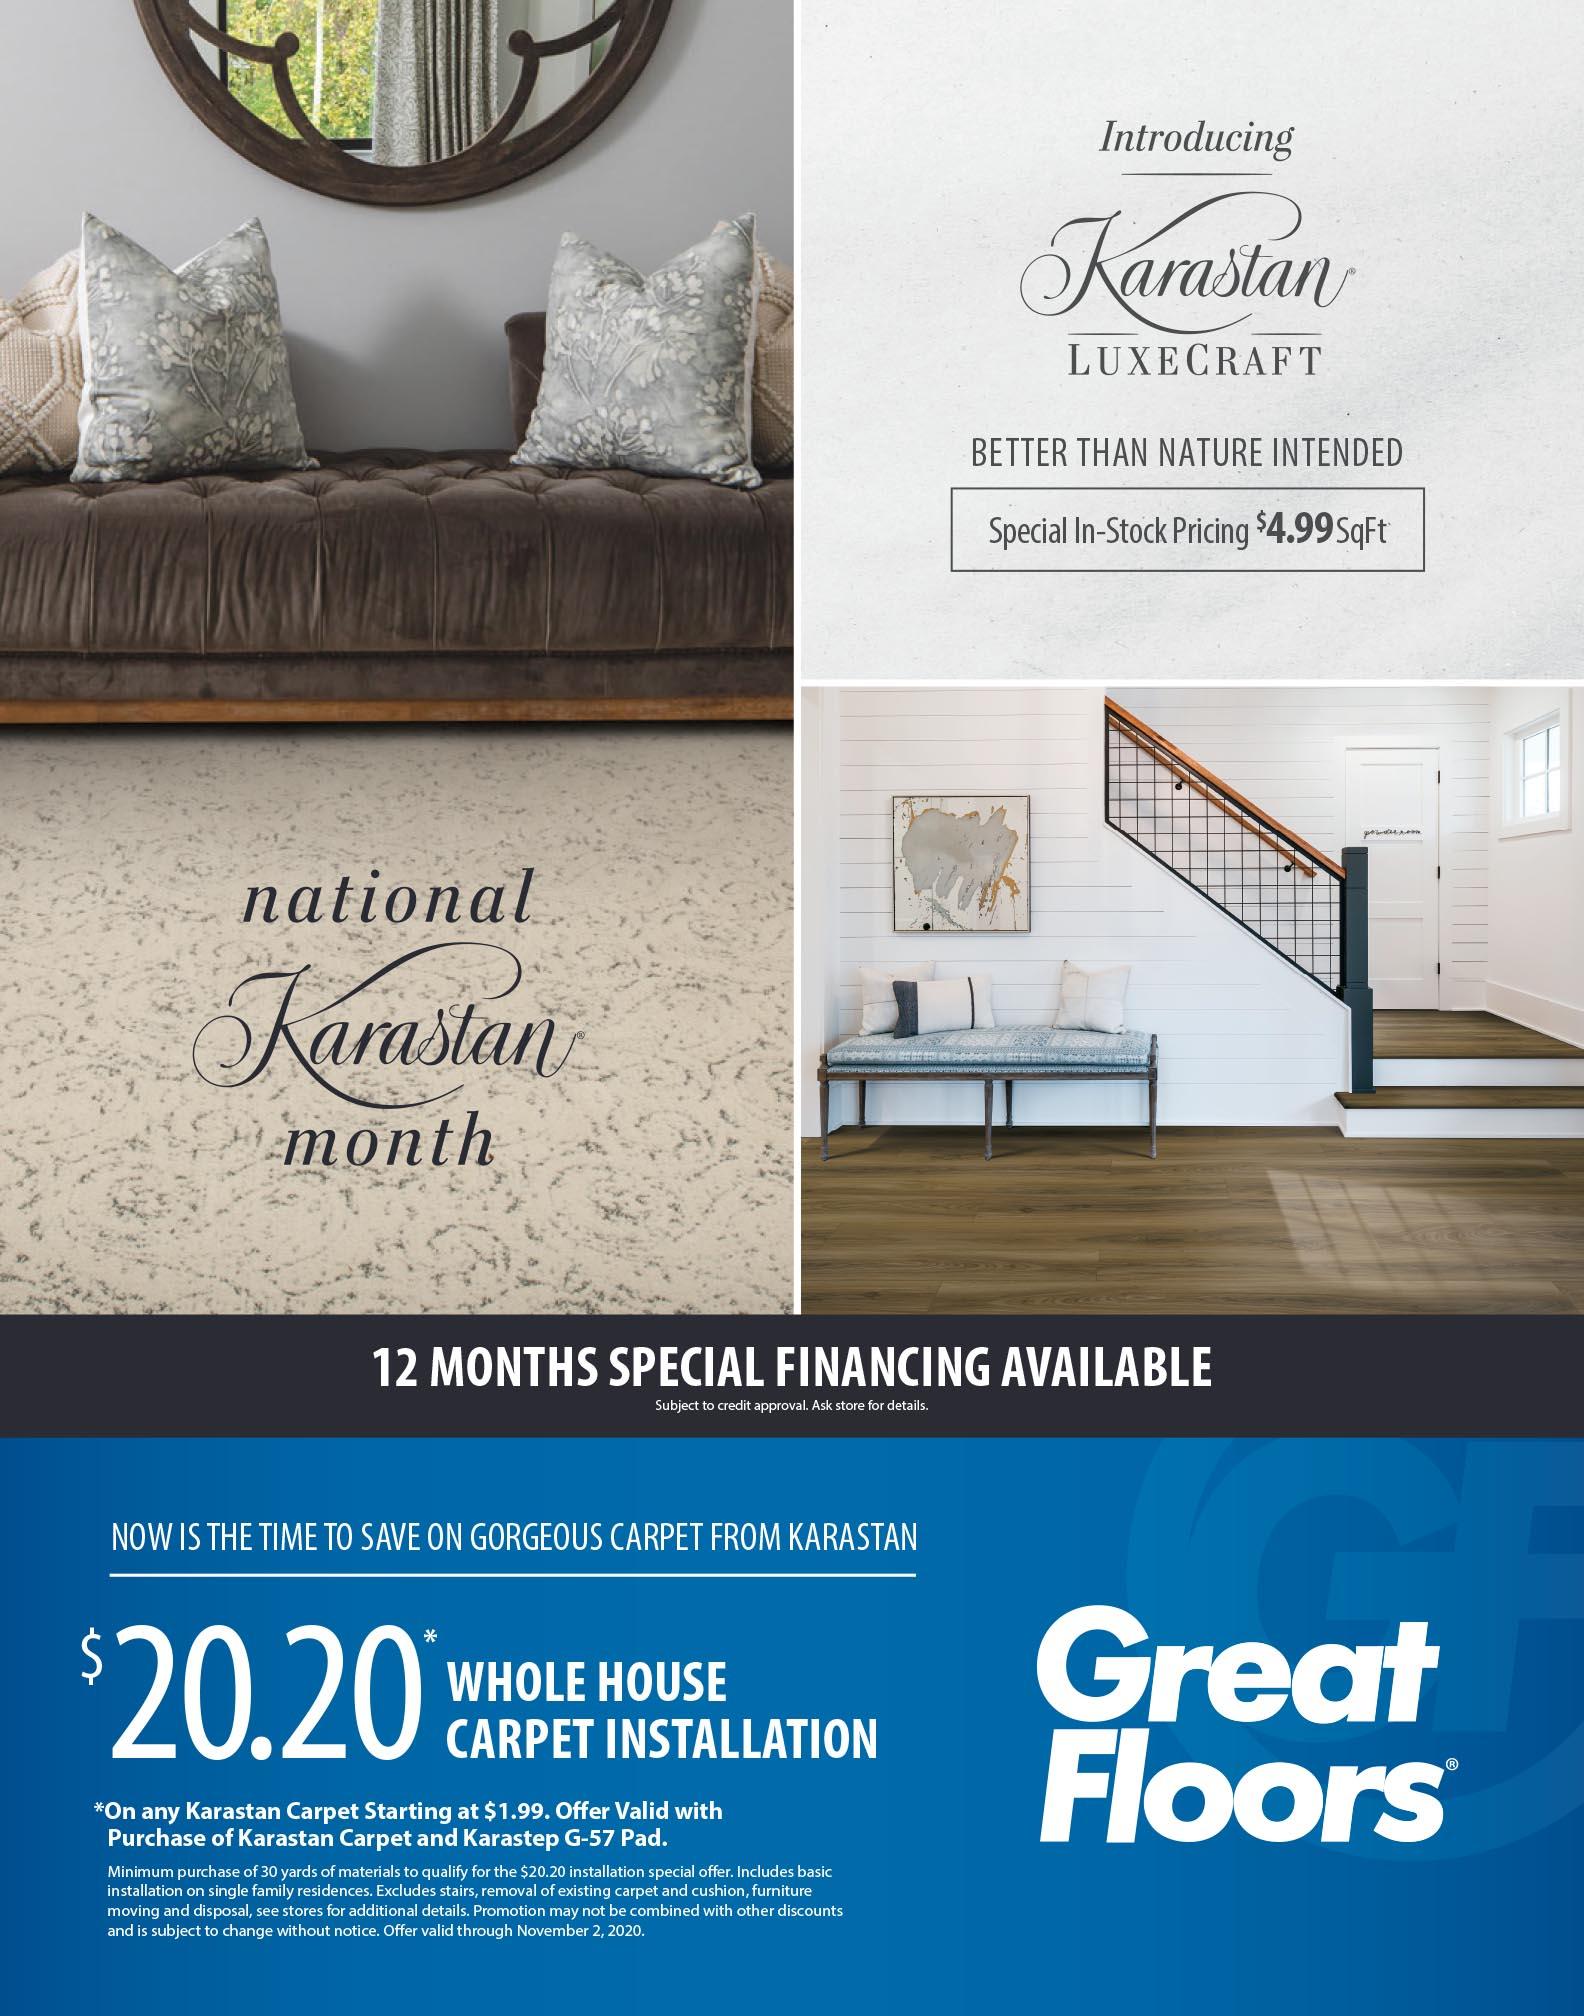 National Karastan Month sale flyer | Great Floors